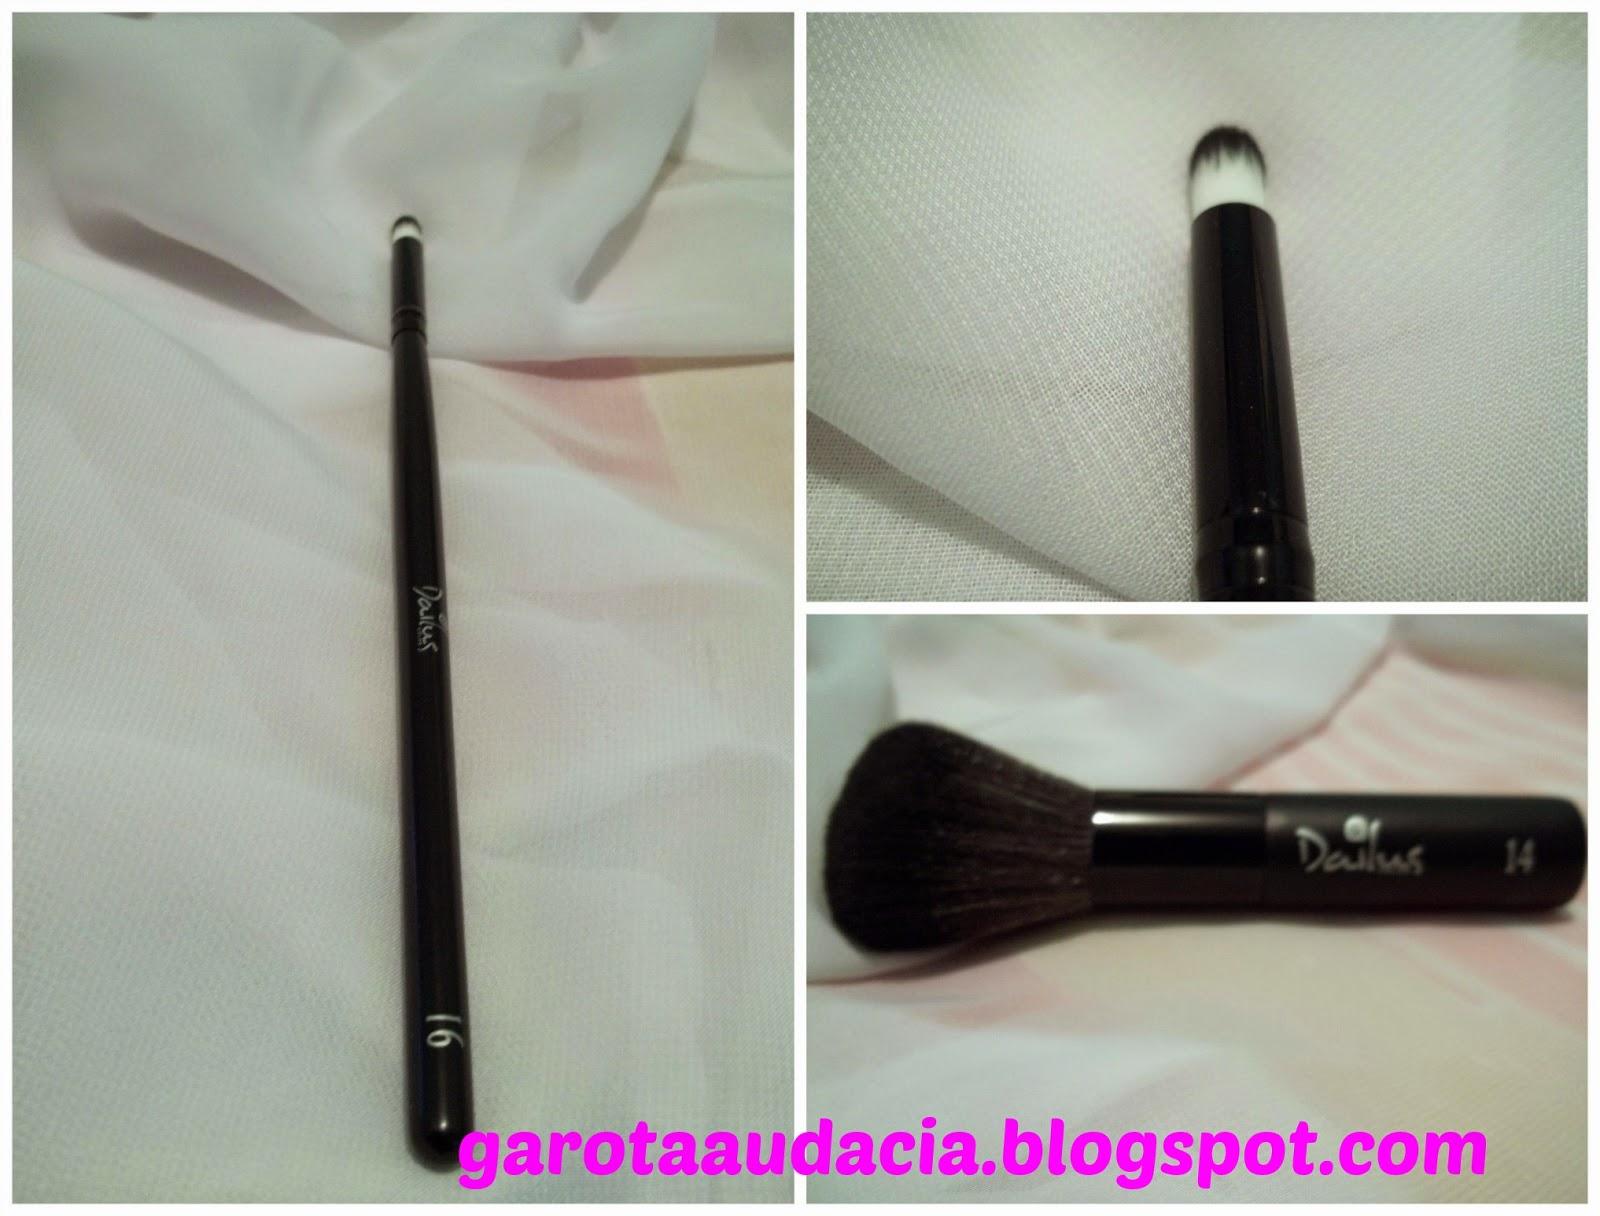 http://garotaaudacia.blogspot.com.br/